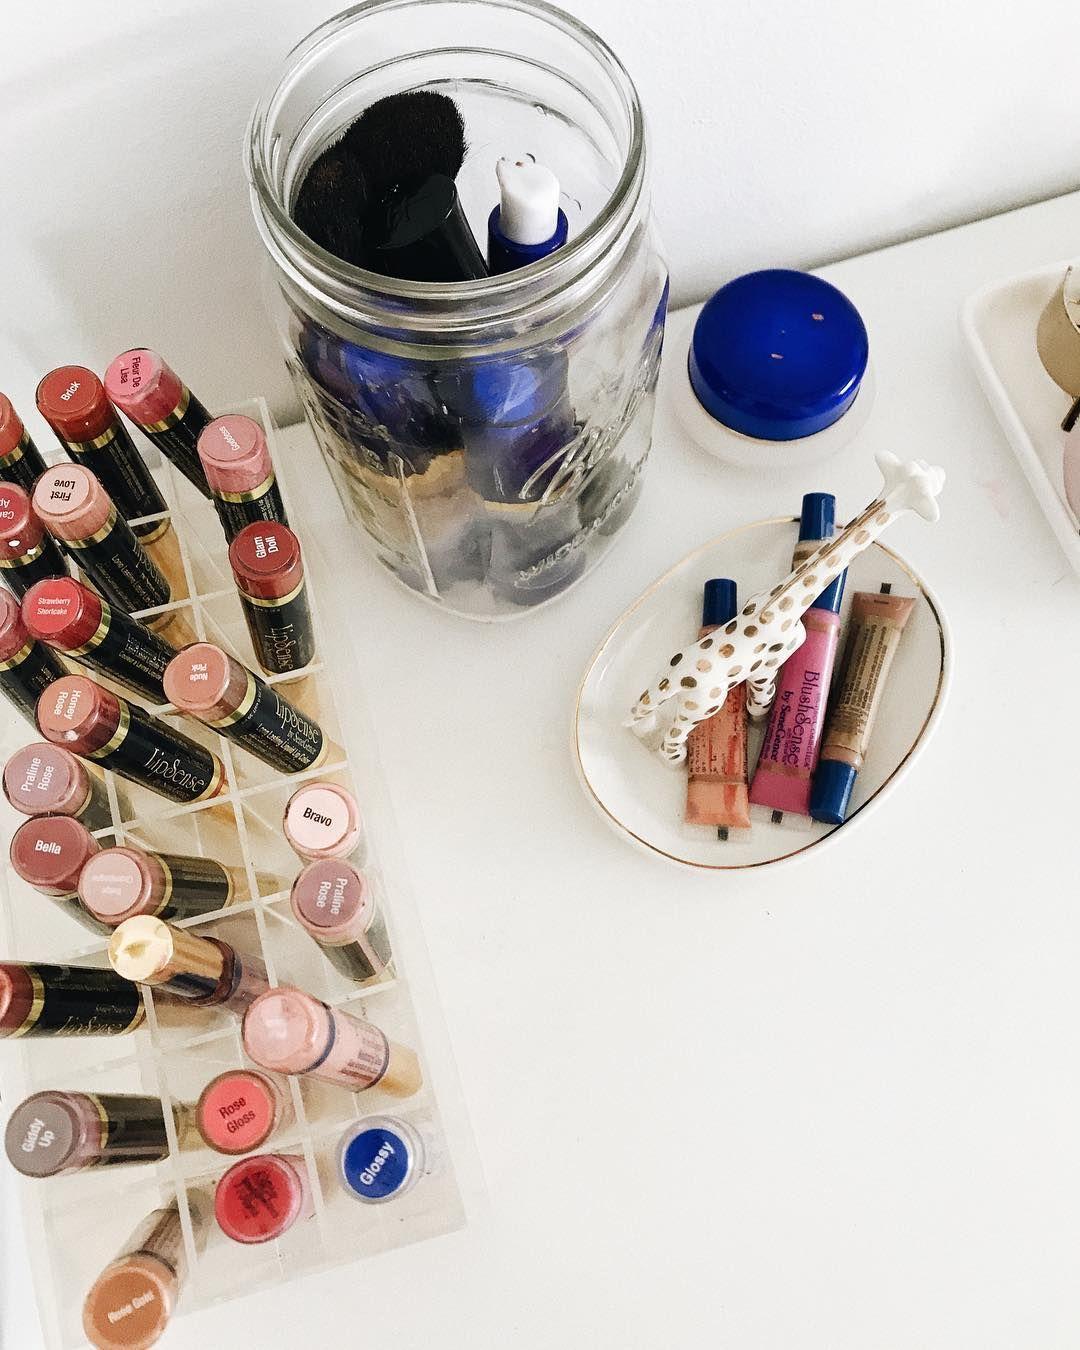 My SeneGence Makeup Storage In Full Swing